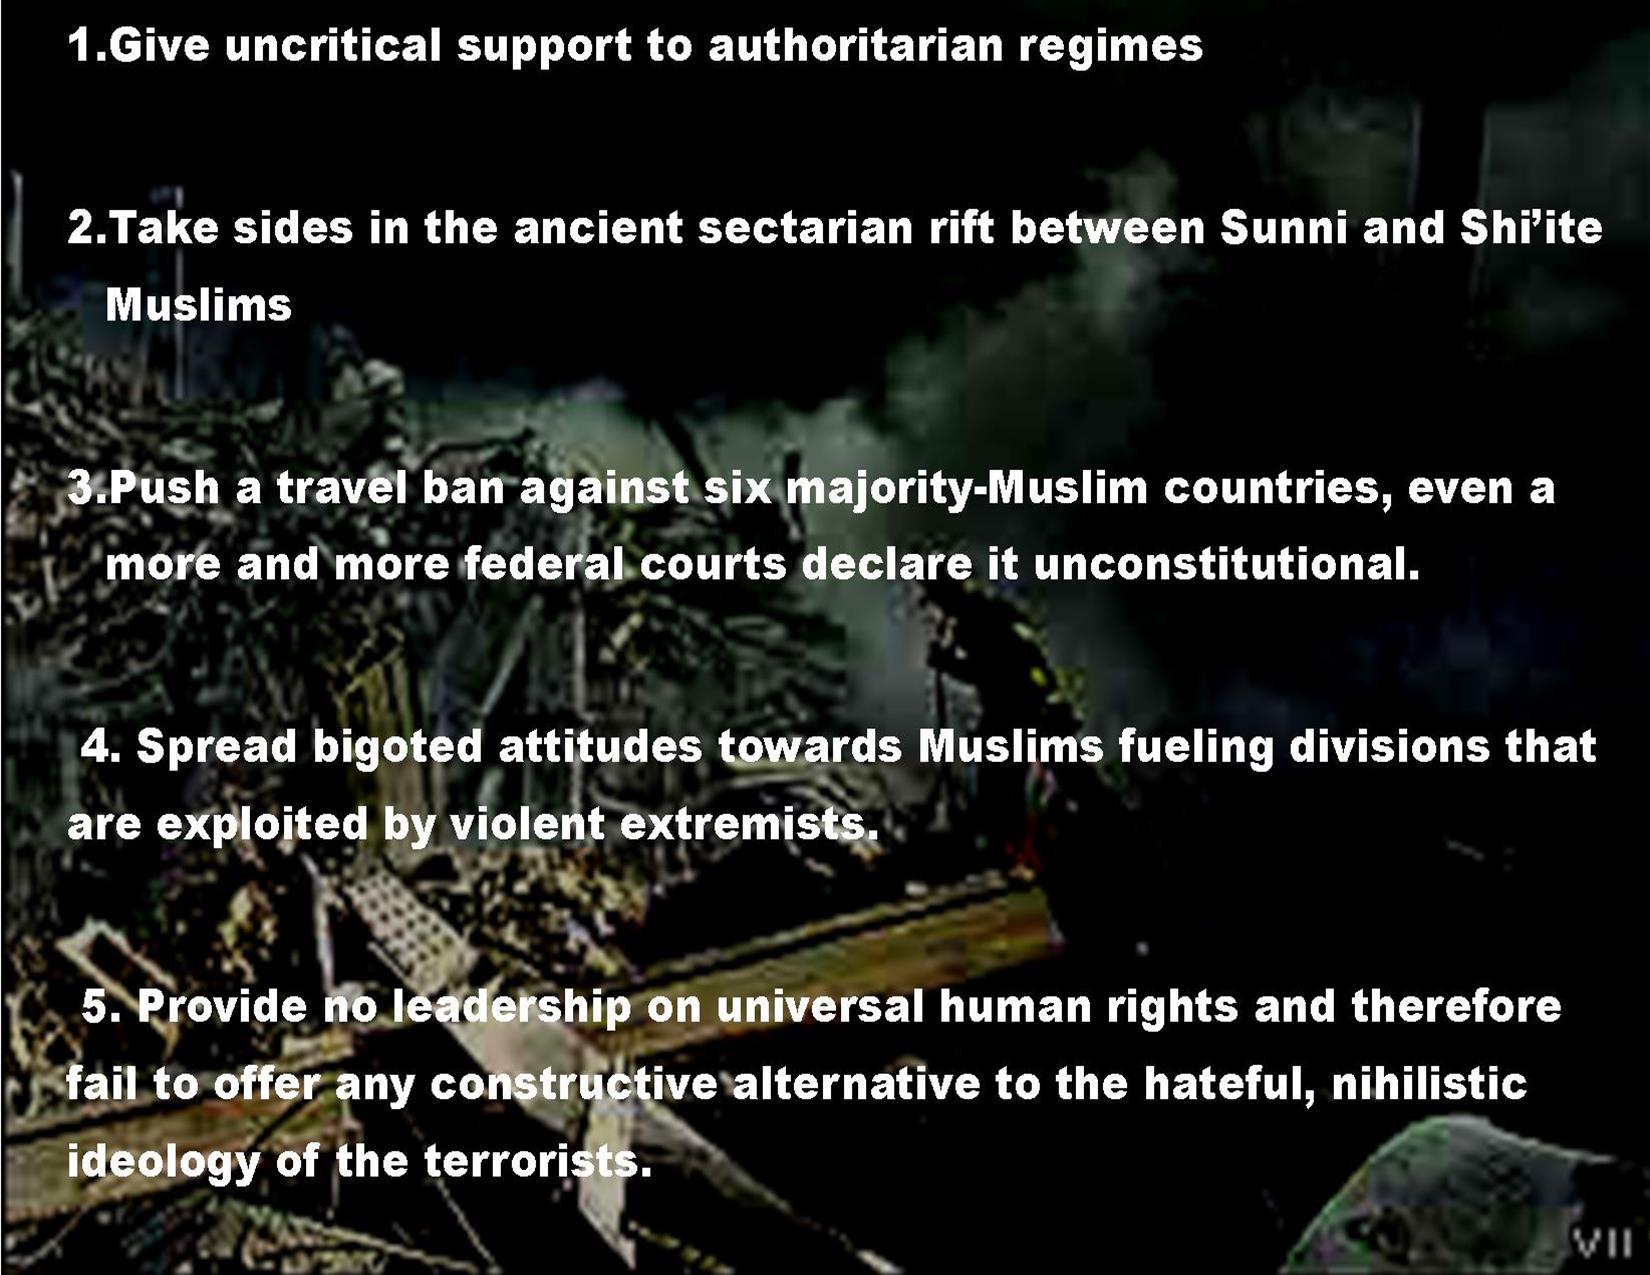 Terrorism Worse